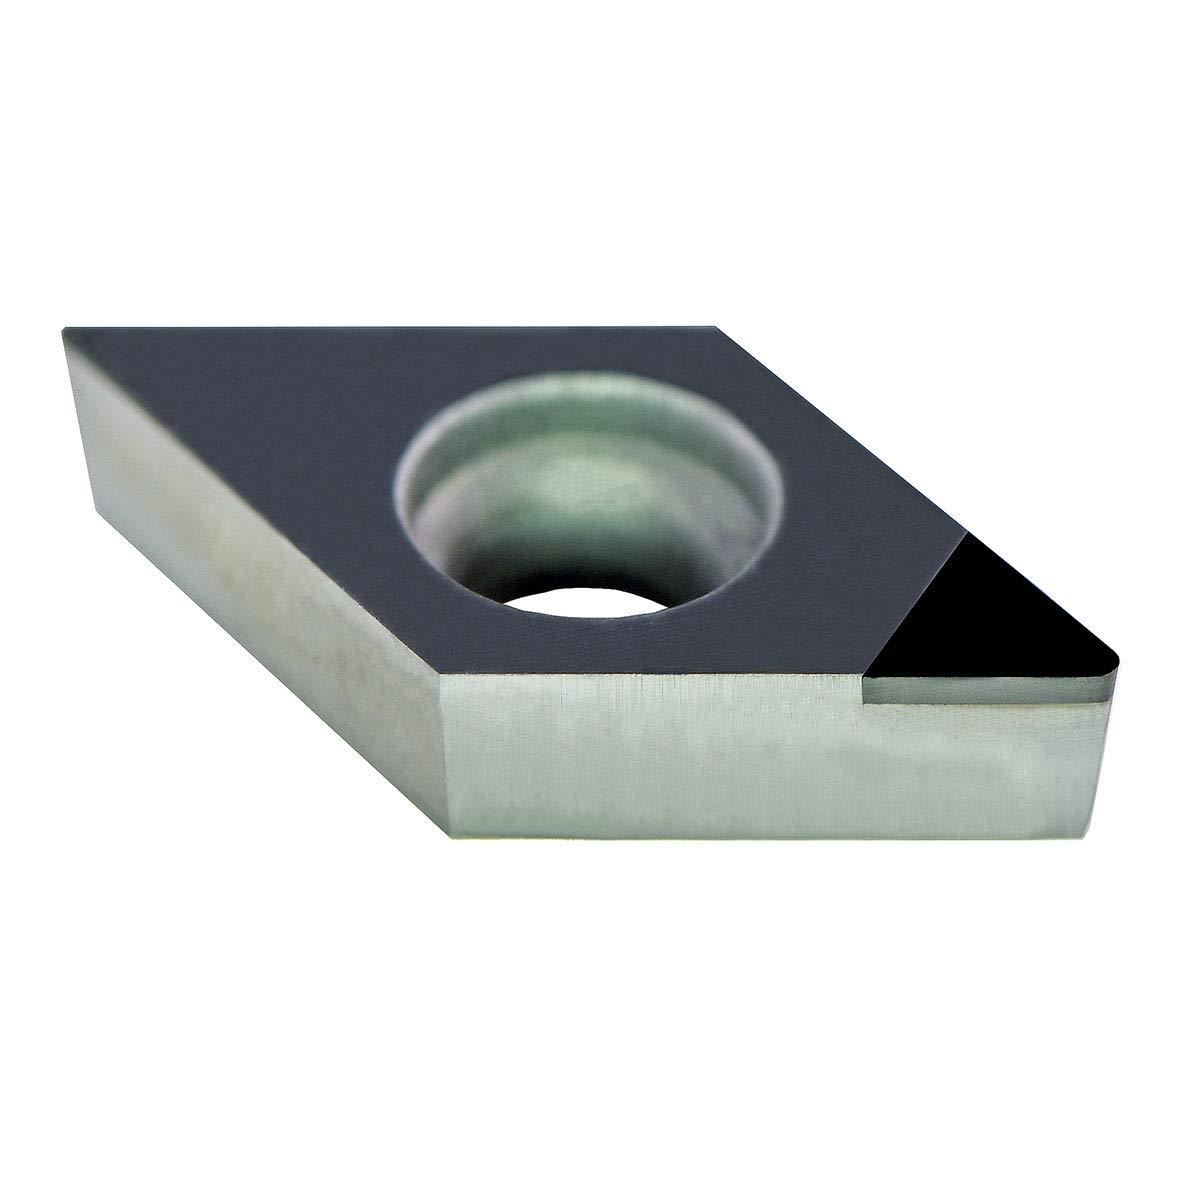 KYOCERA RPGT1204M0ERSM CA6535 Milling Insert RPGT 0.236 Corner Radius 6 Cutting Edges Right Hand TiCN//Al2O3//TiN Round CA6535 Grade Carbide